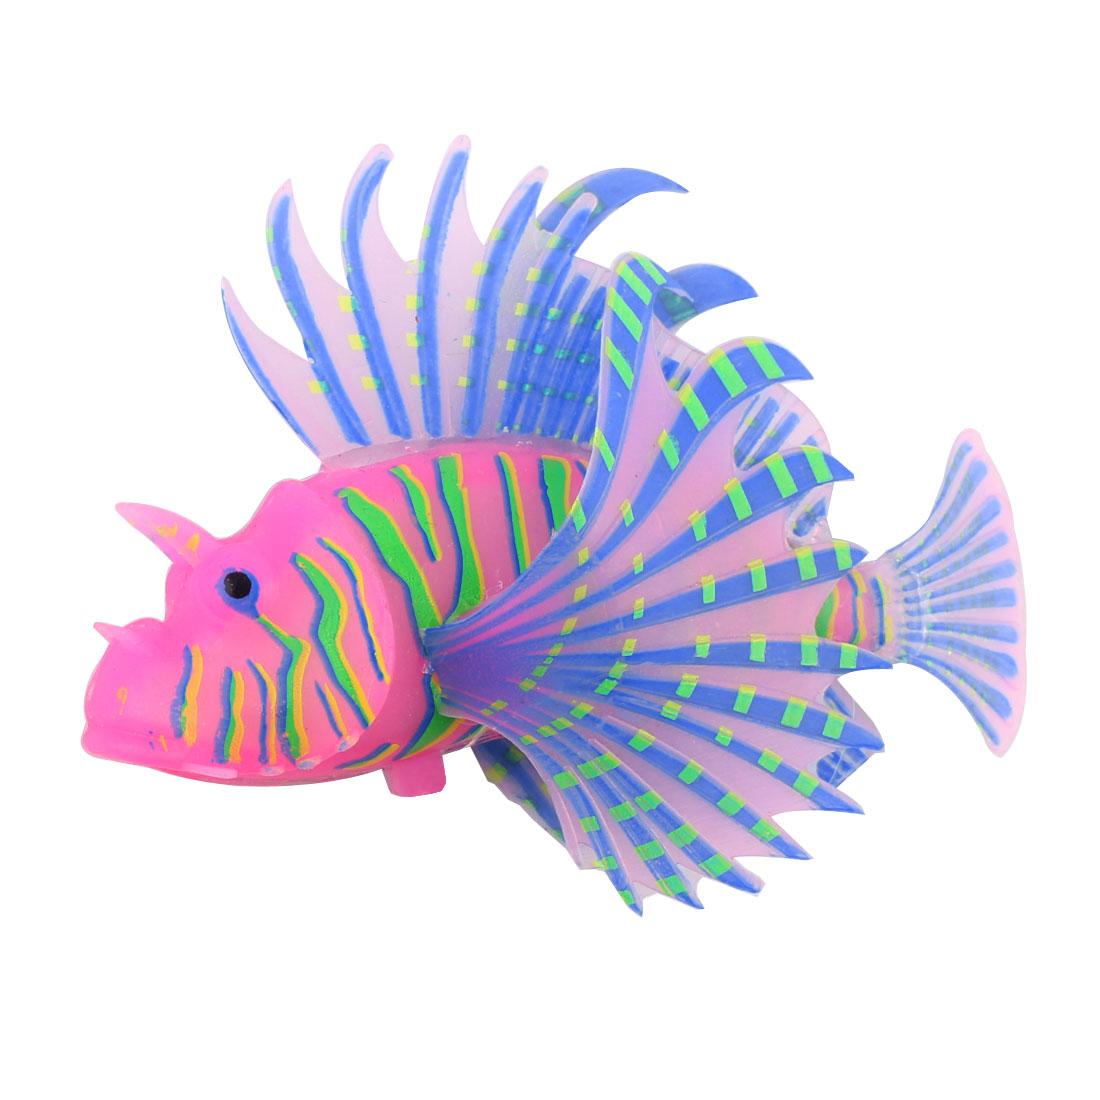 Aquarium Fish Tank Silicone Sucker Simulated Design Glowing Lifelike Lionfish